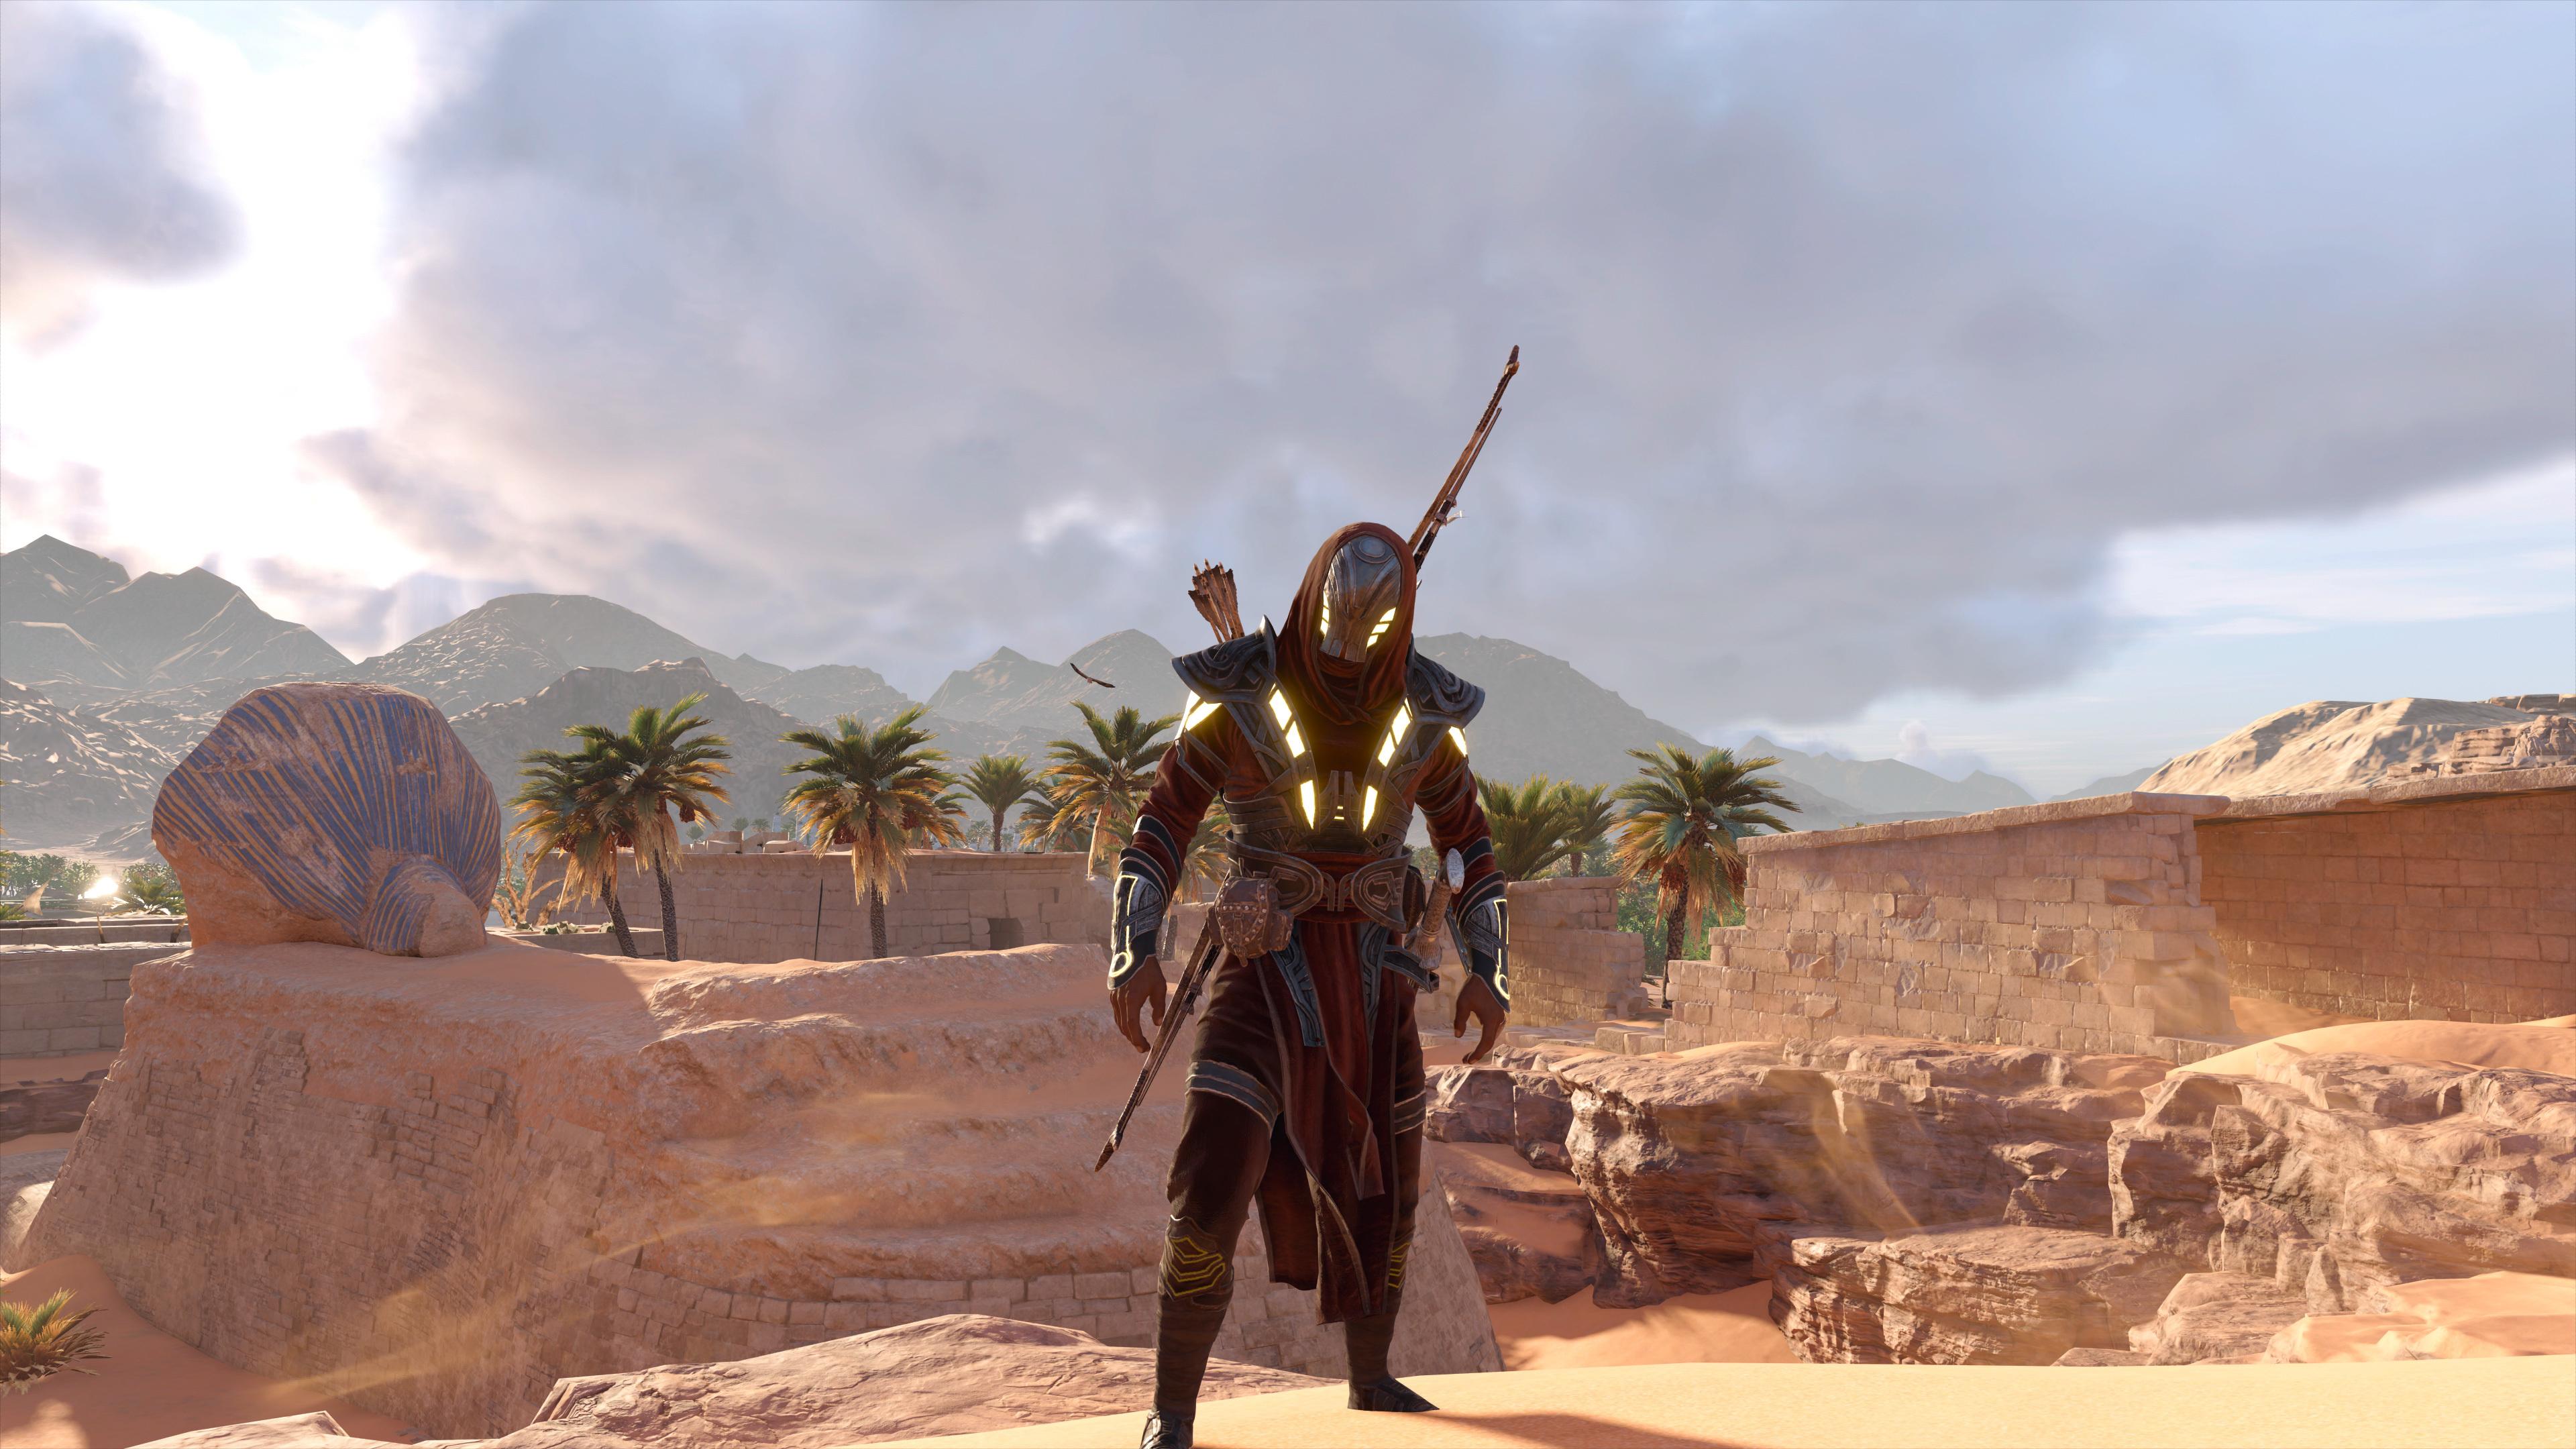 Desktop Wallpaper Assassin S Creed Origins Desert Video Game 4k